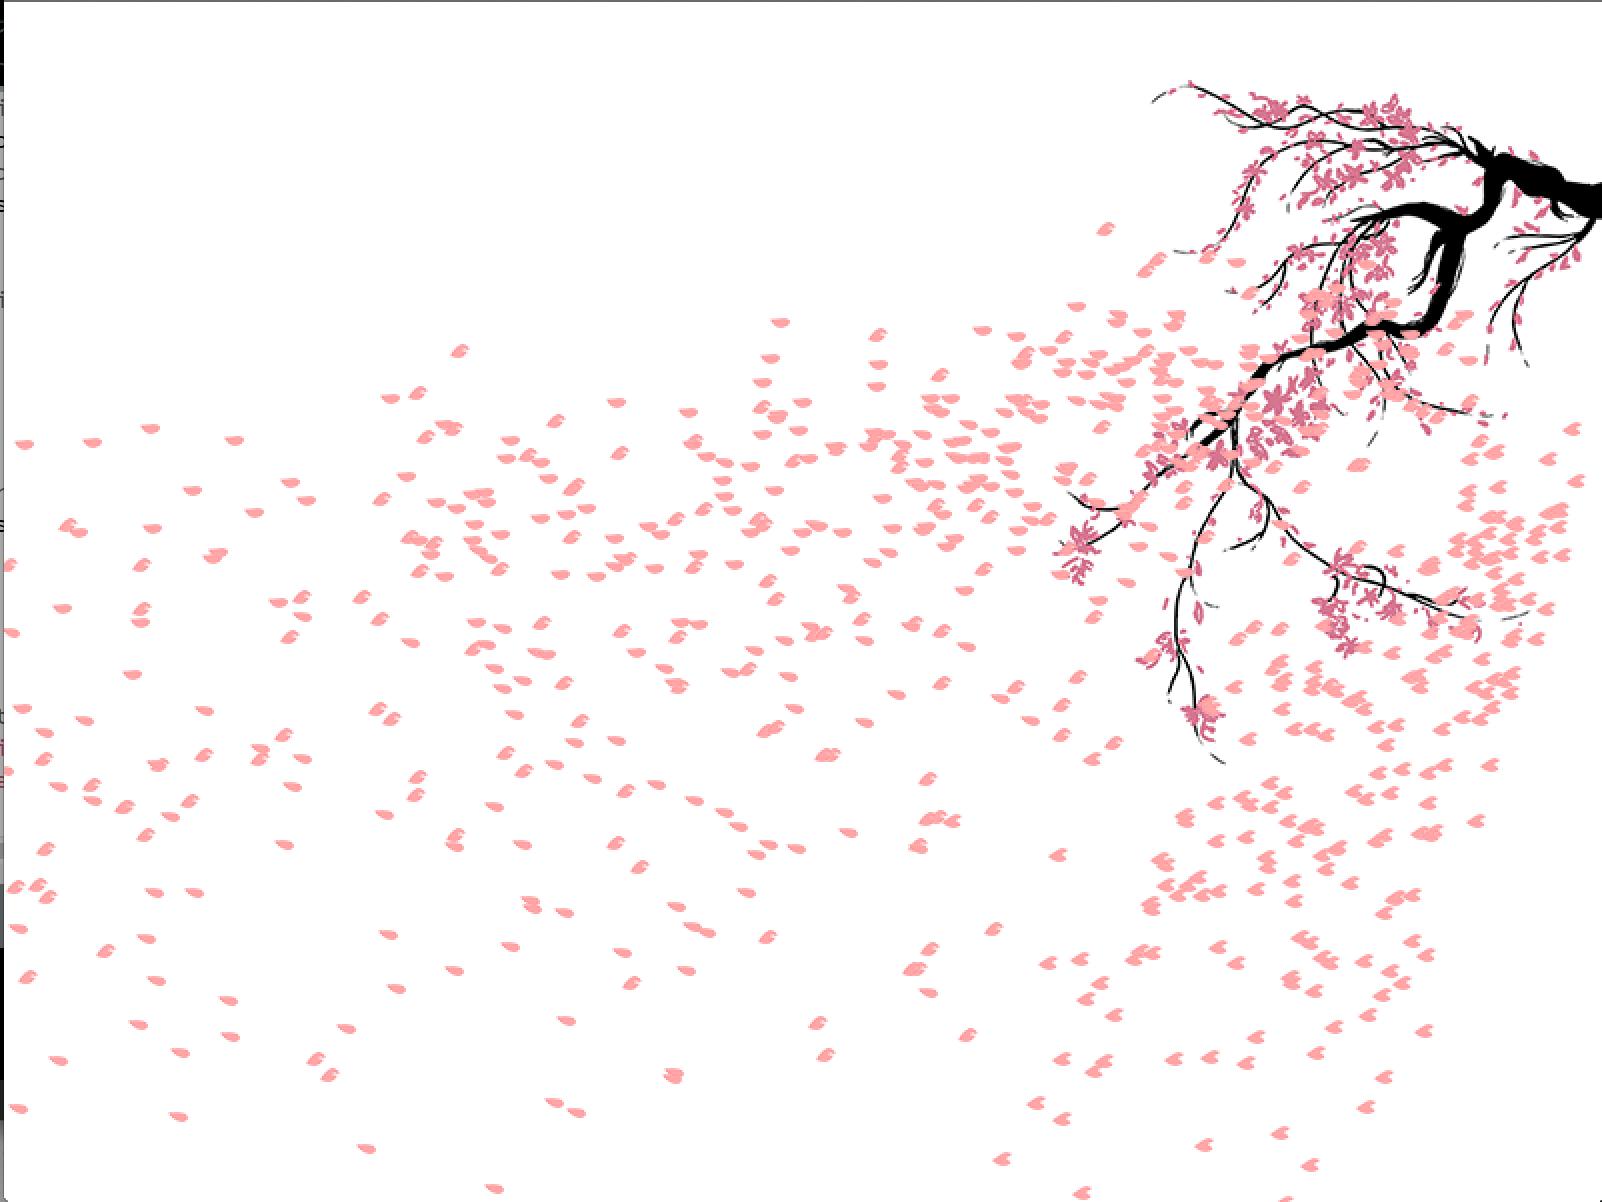 Falling Water House Wallpaper Blossom Petals Png Sakura 34546 Free Icons And Png